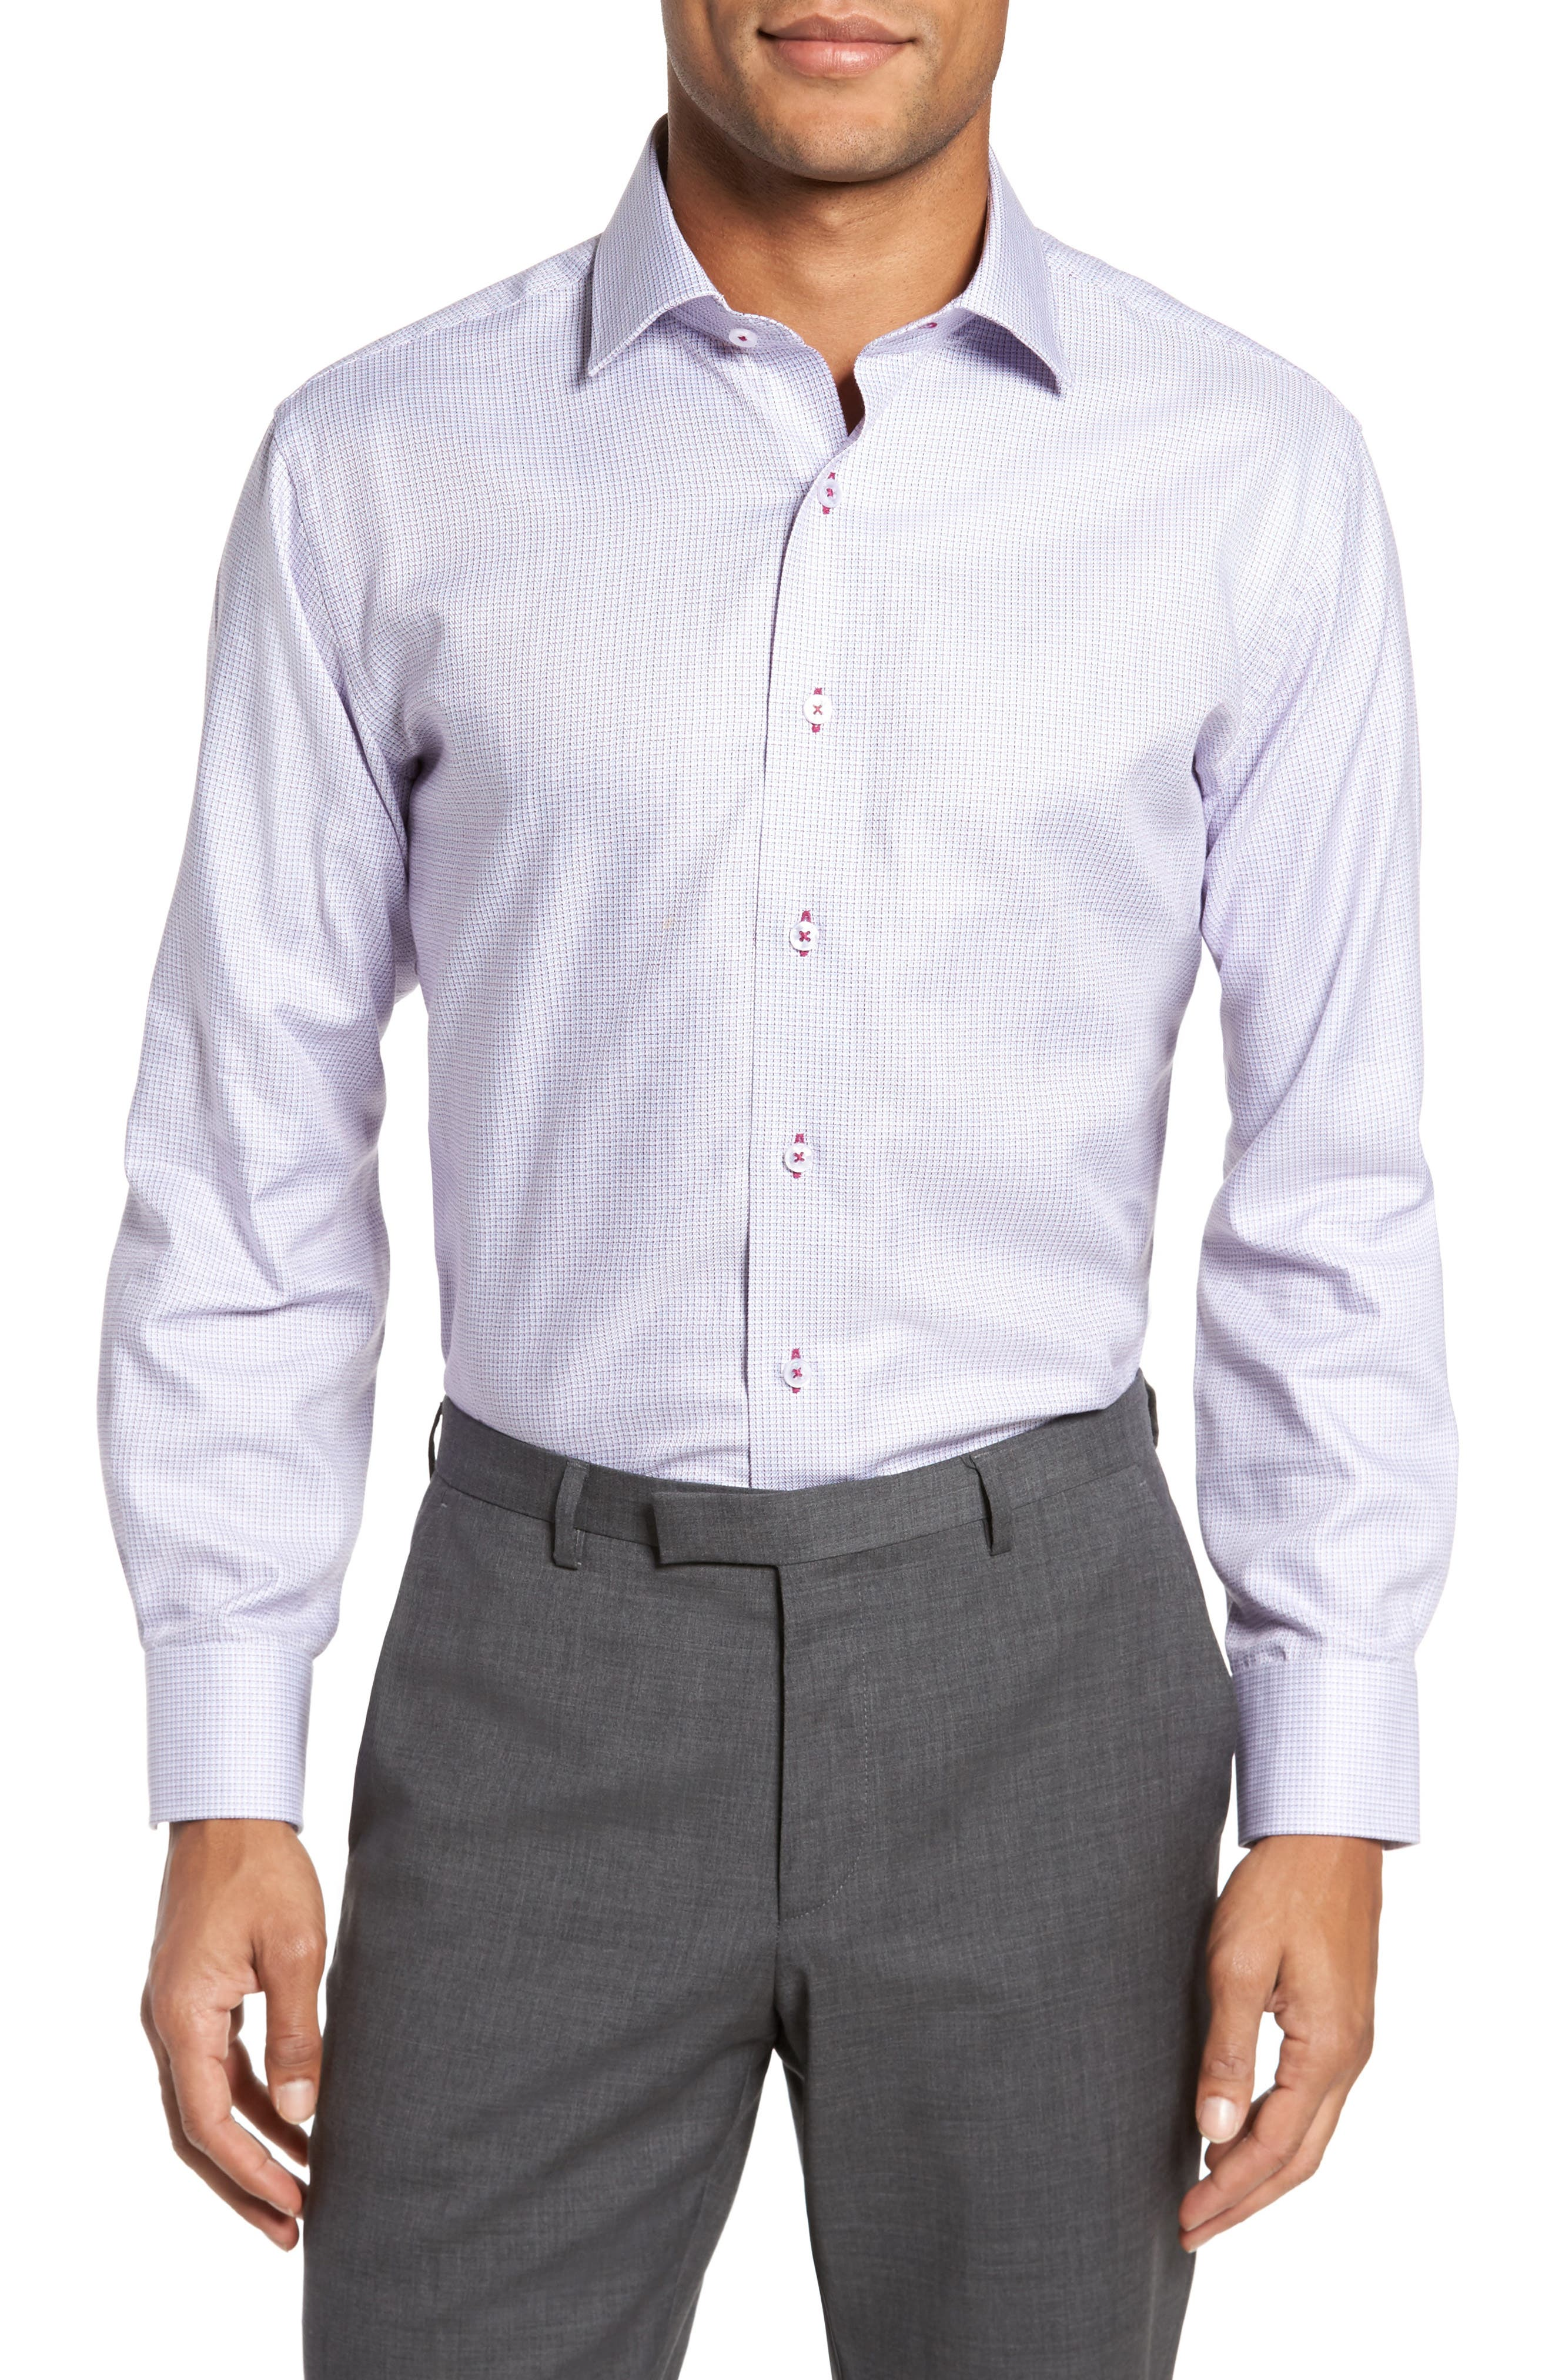 Trim Fit Textured Check Dress Shirt, Main, color, 450